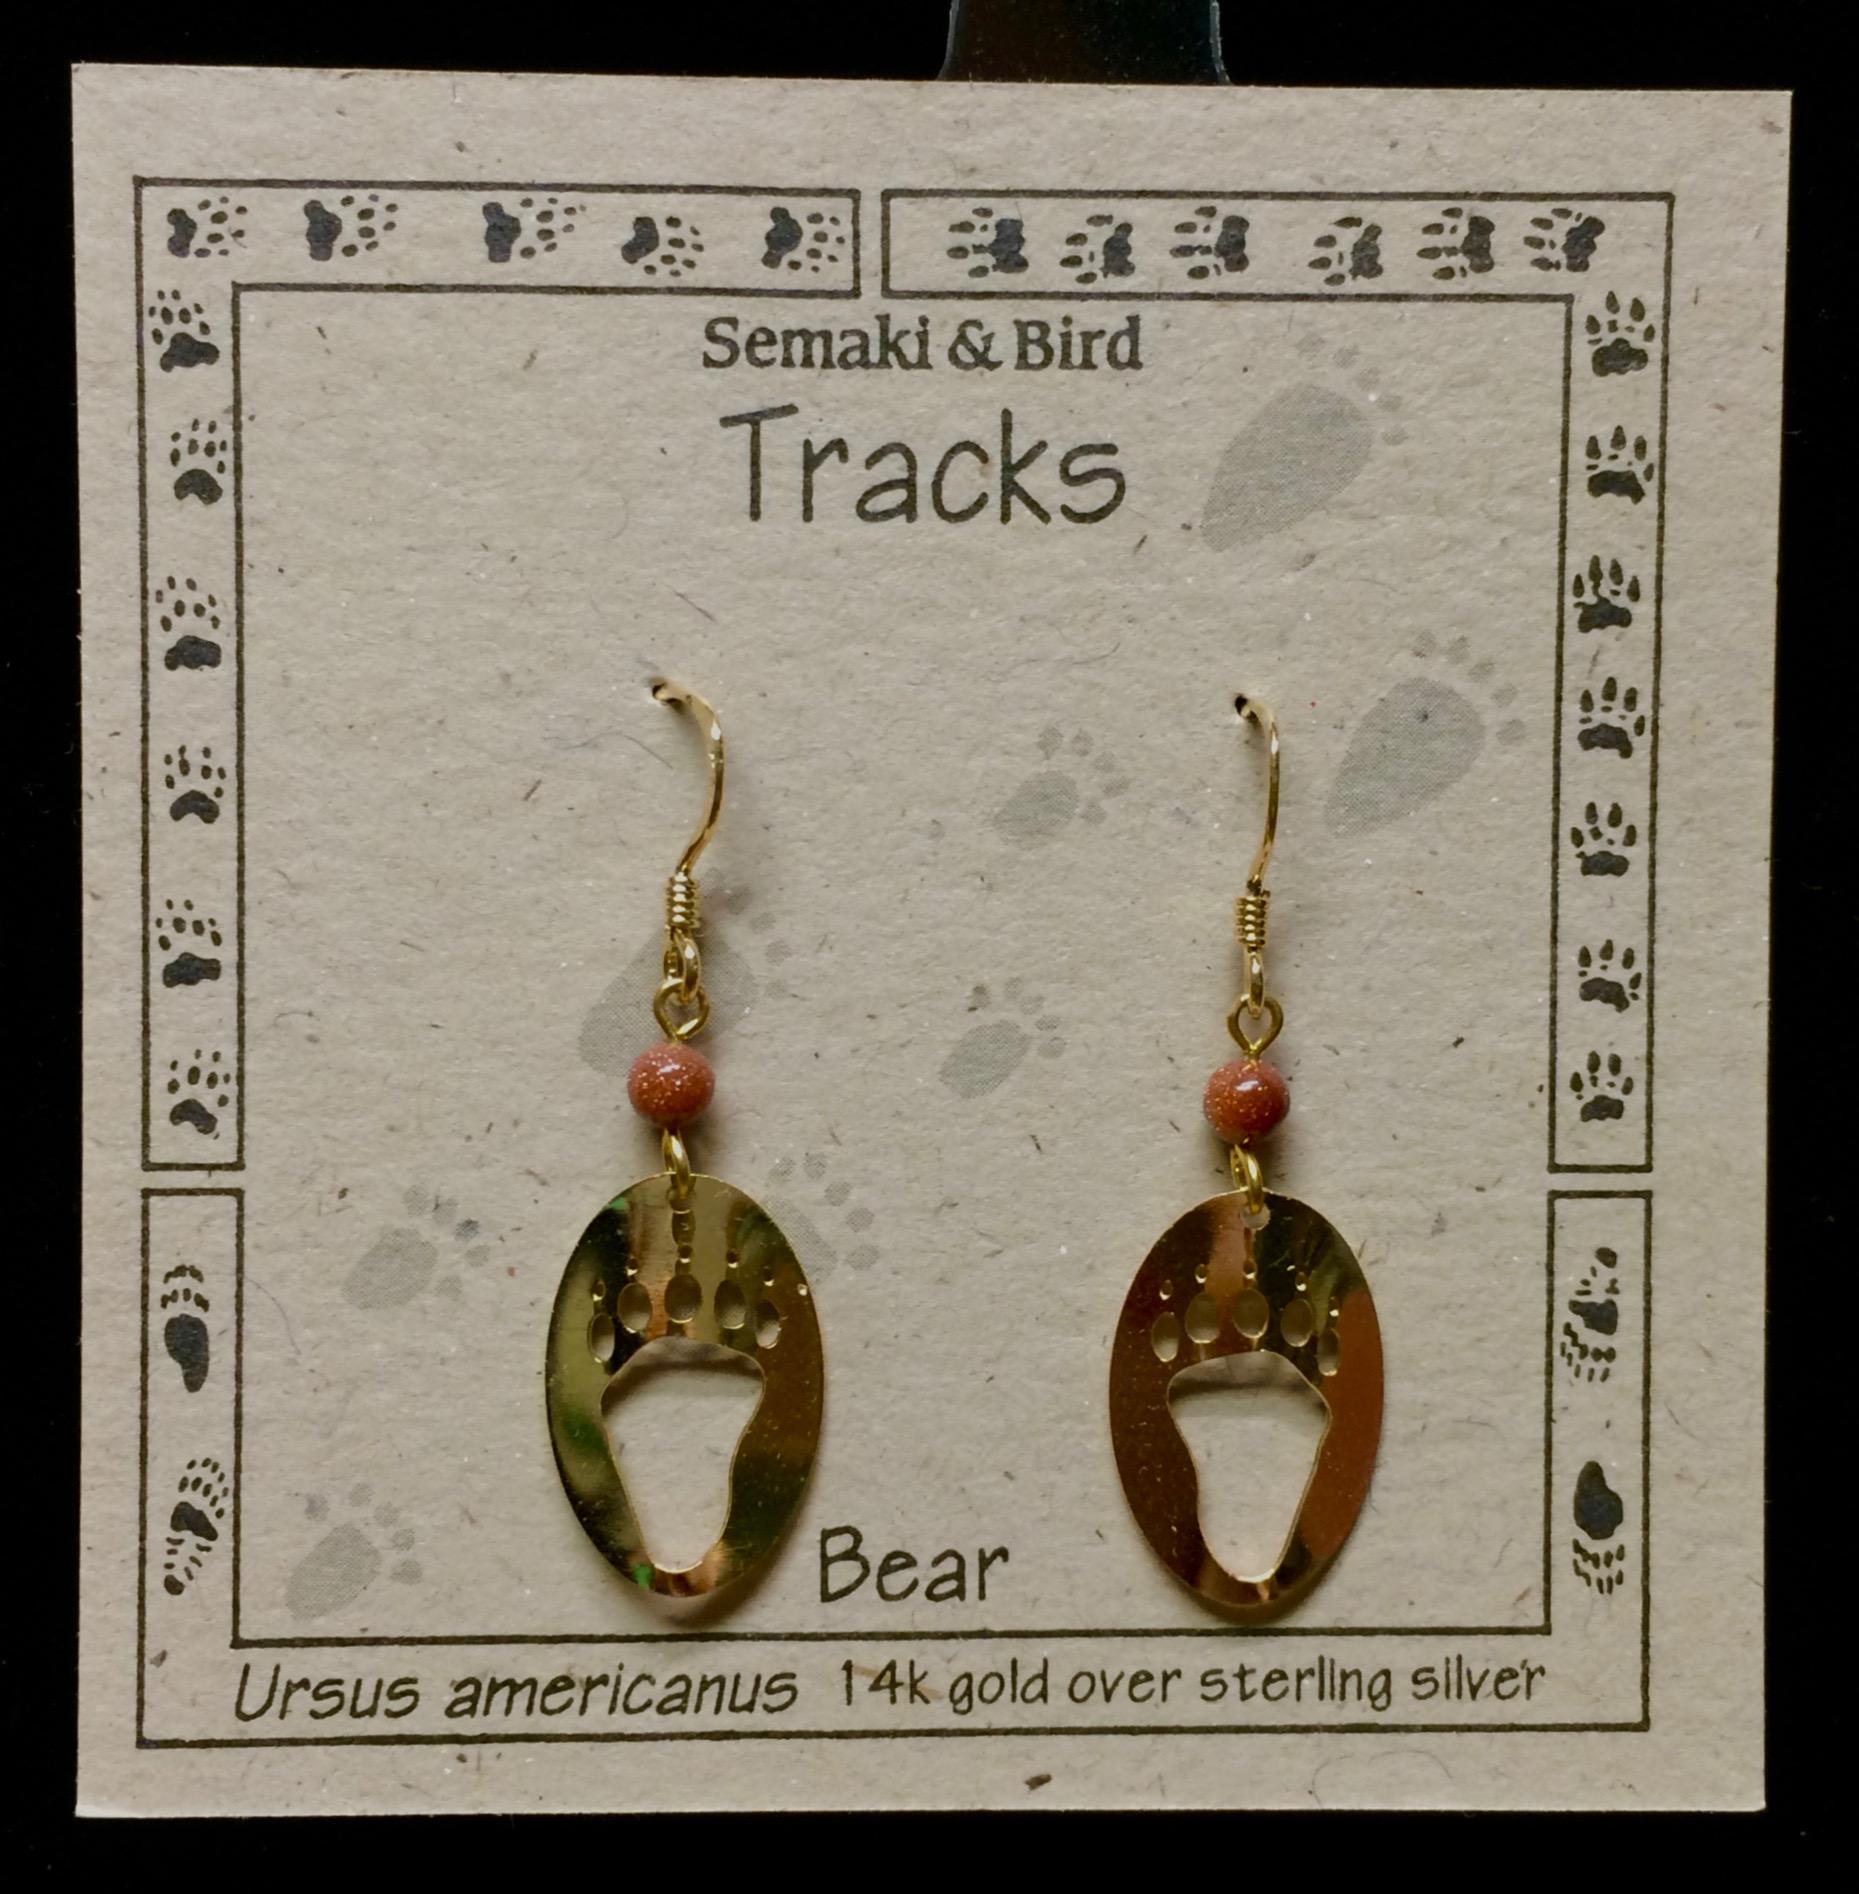 bear-trax-earrings.jpg